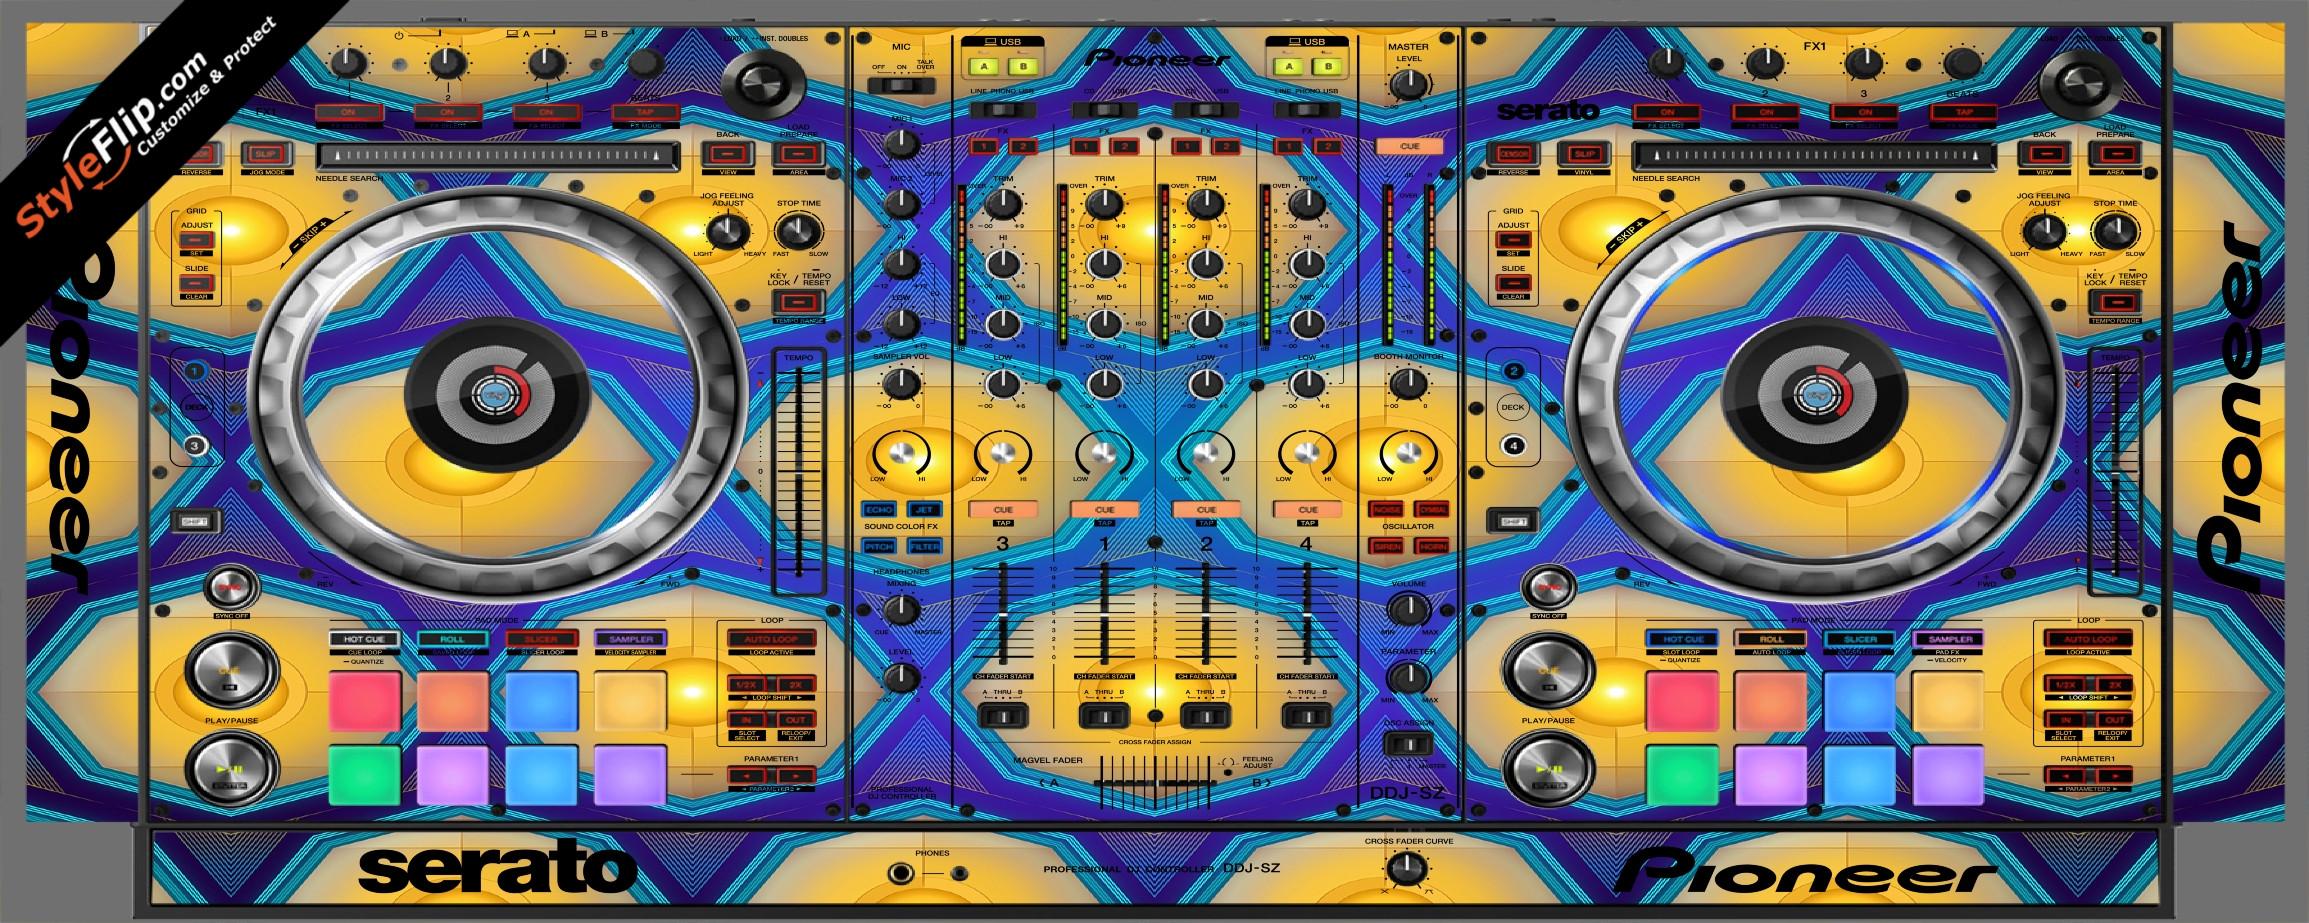 Honeycomb  Pioneer DDJ-SZ